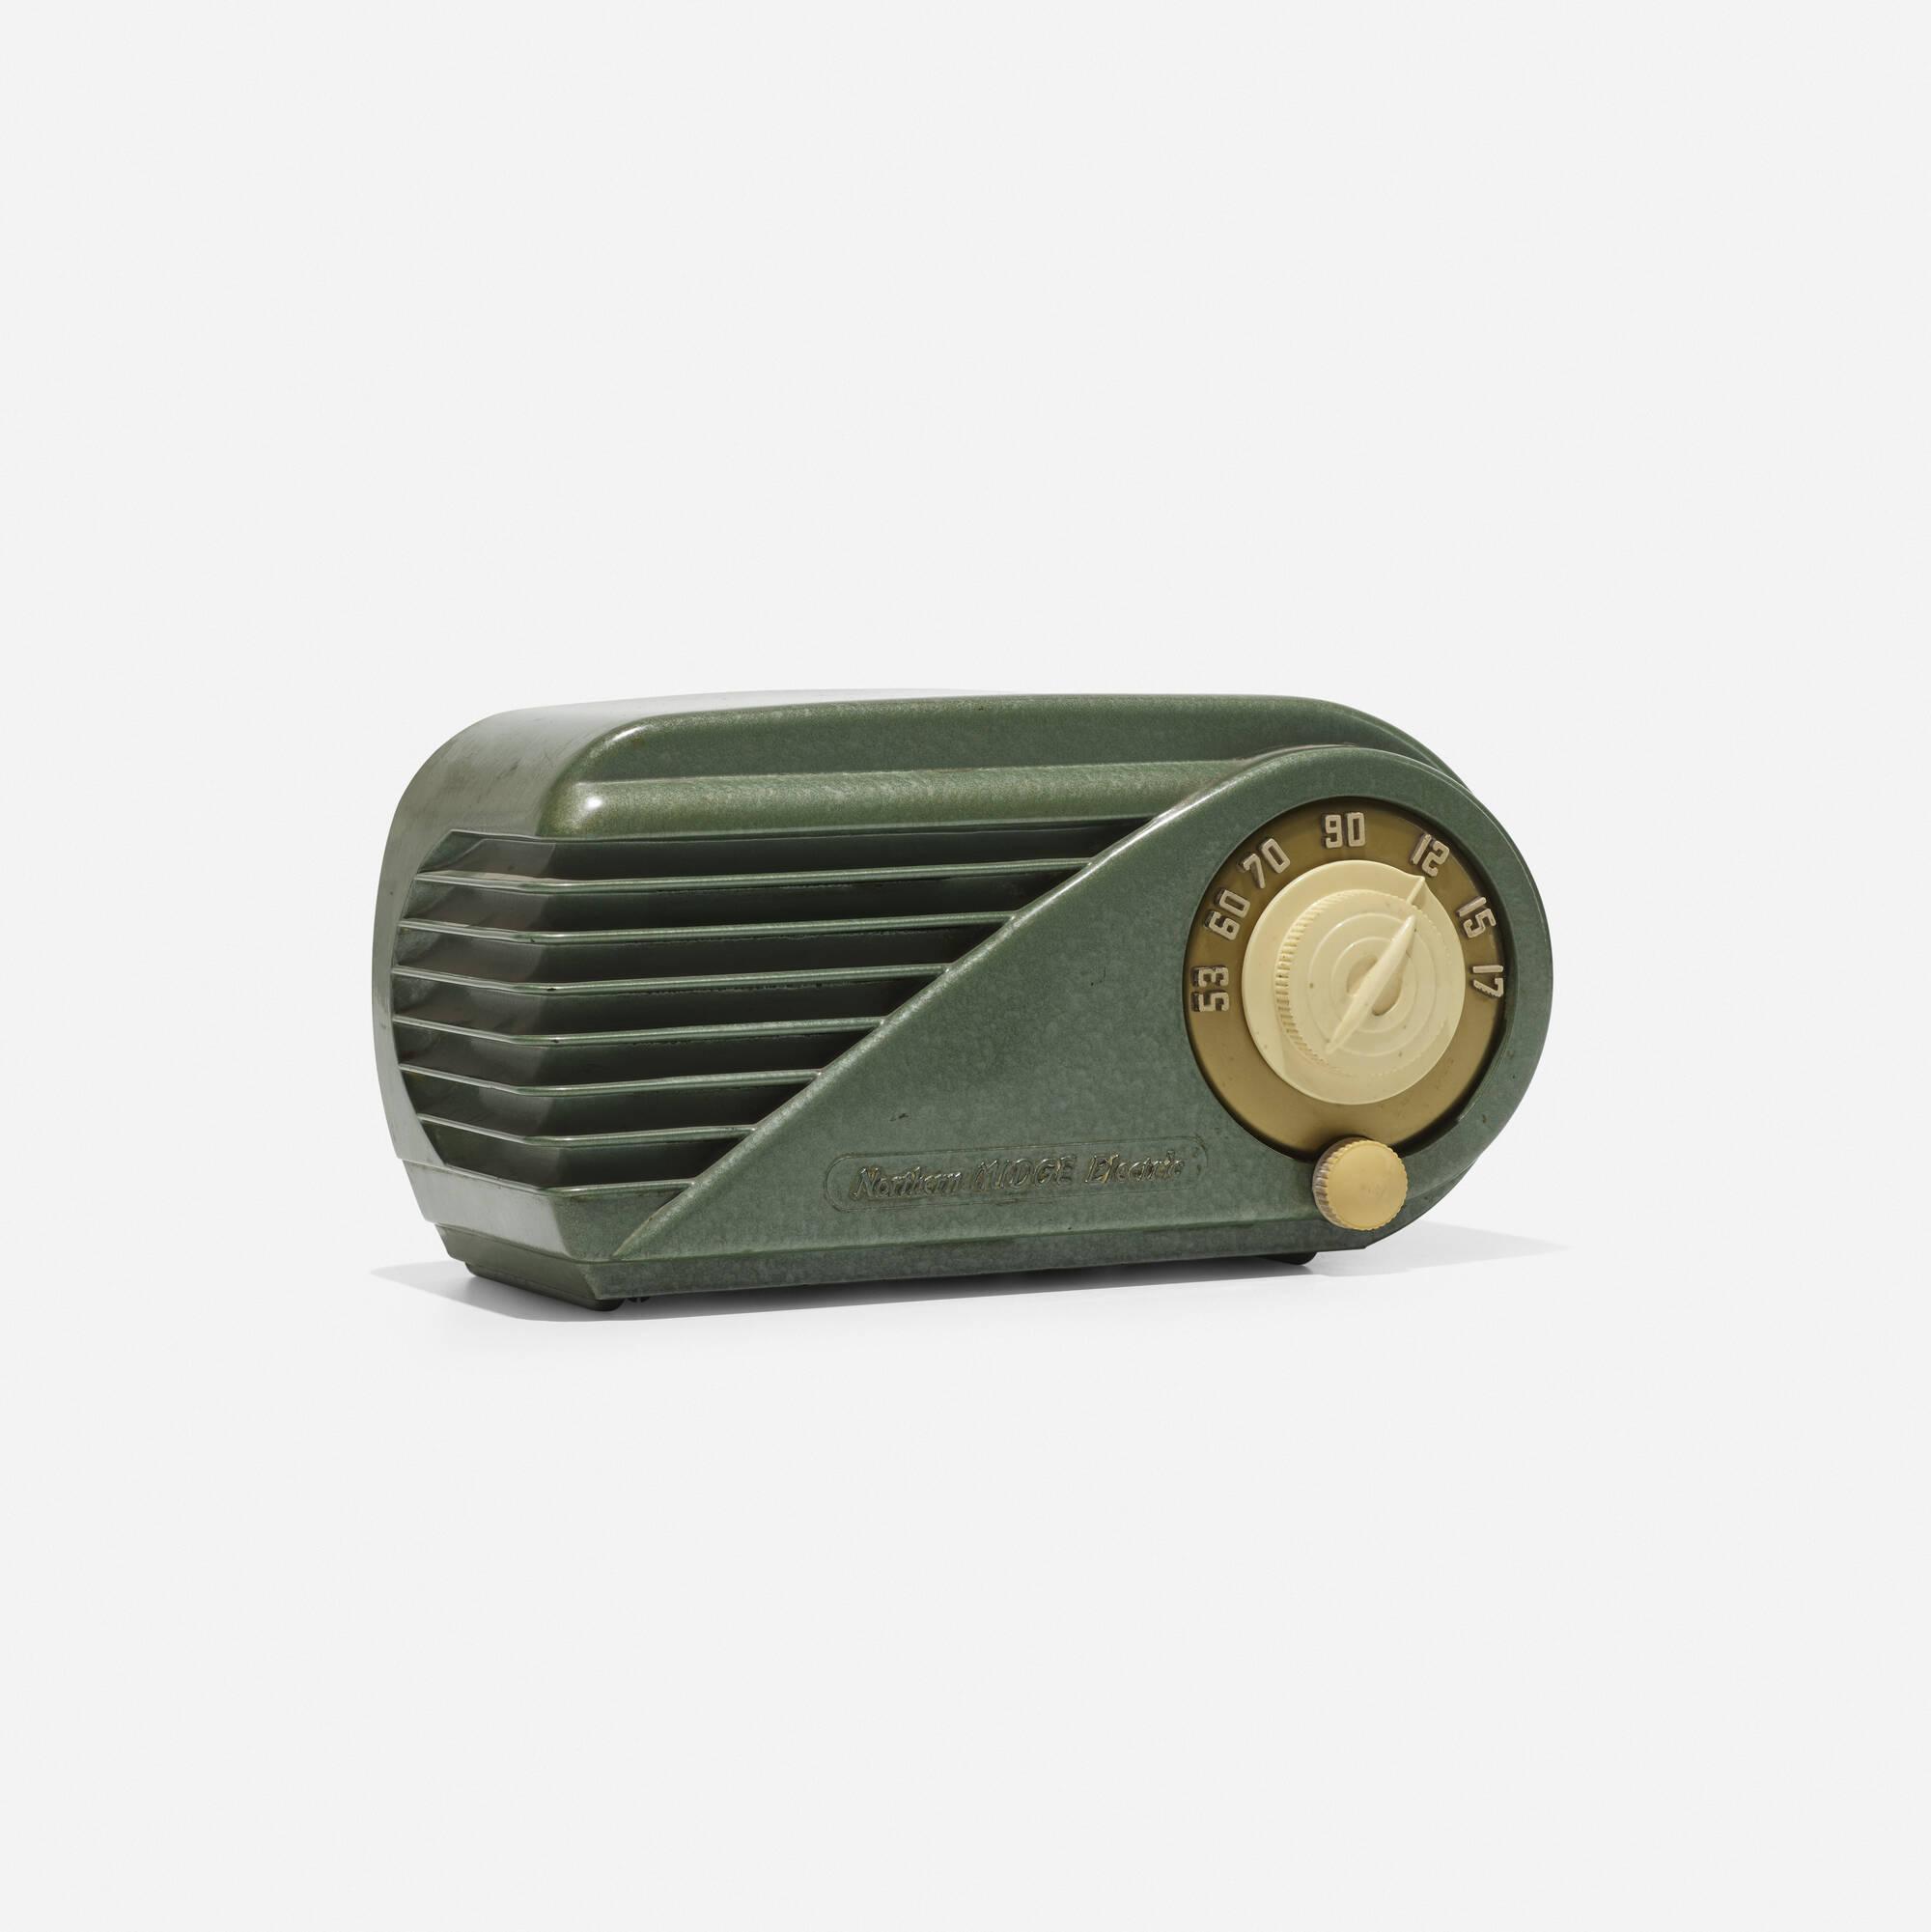 192: Northern Electric / Midge radio, model 5508 (1 of 3)